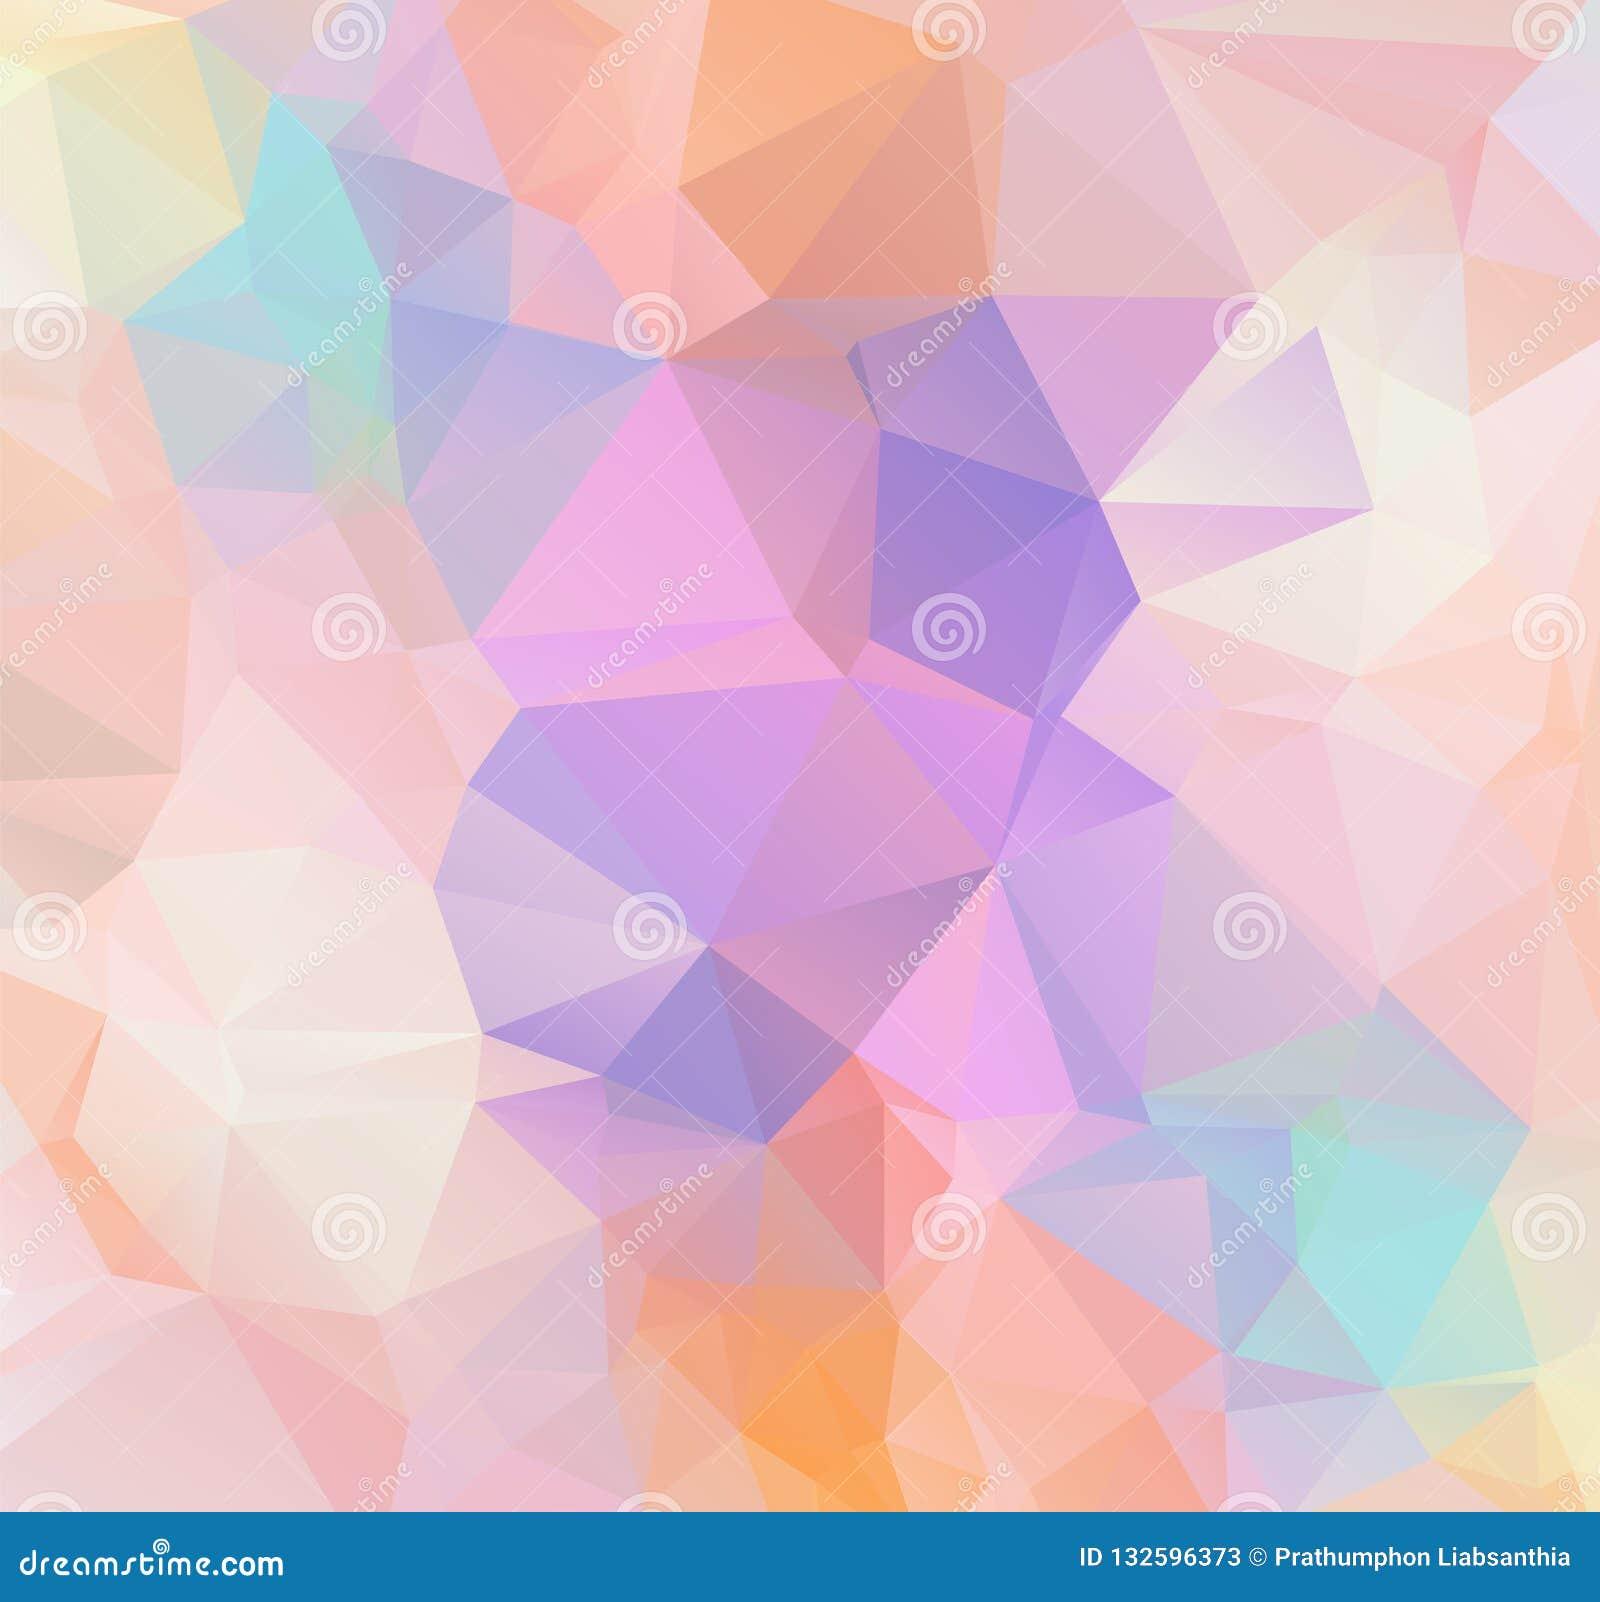 Fundo poligonal geométrico do sumário - baixo patt poli do triângulo